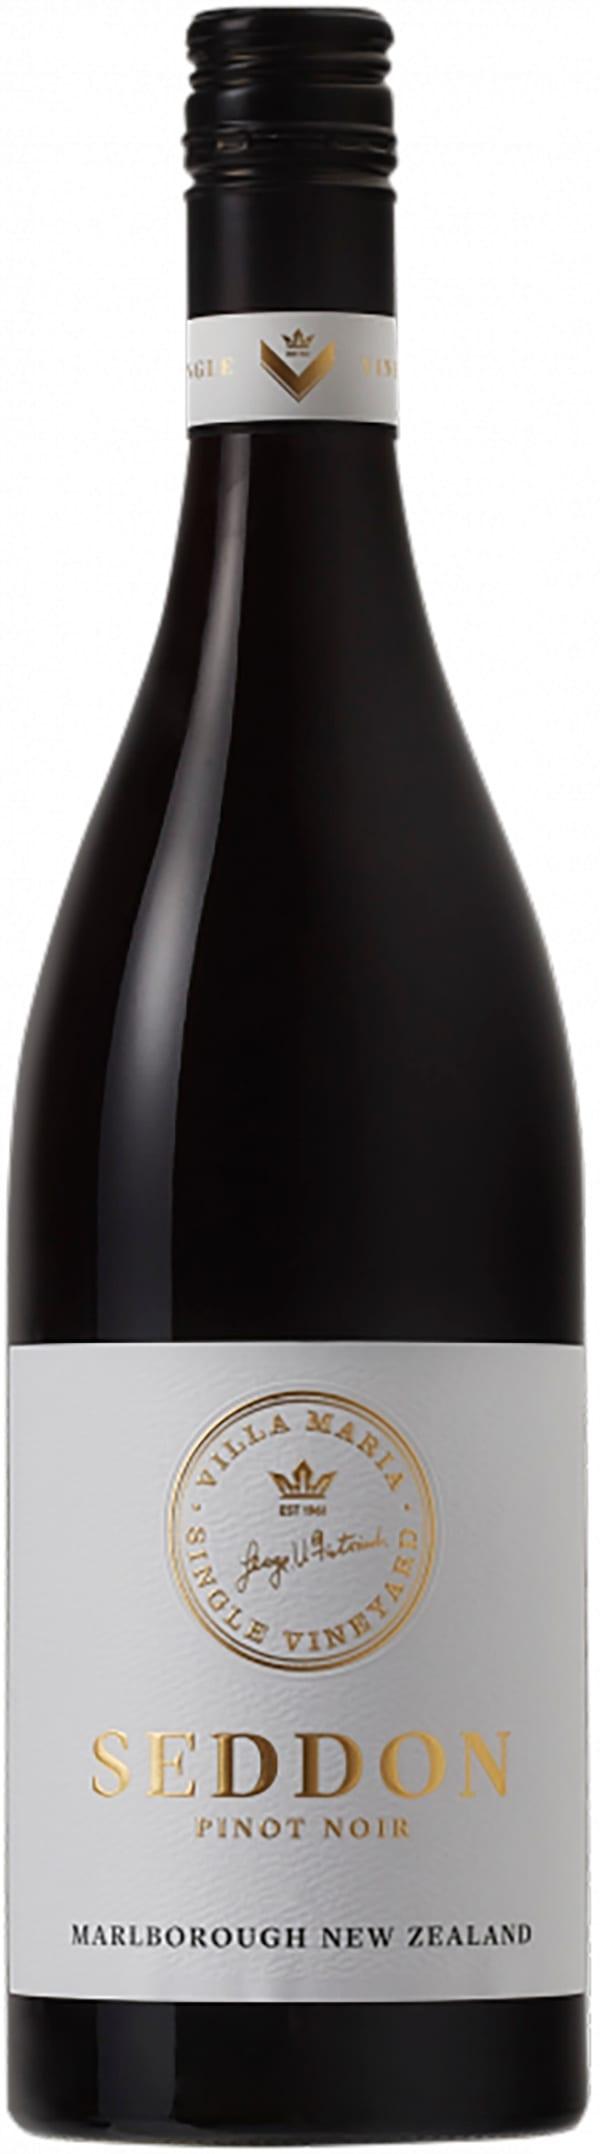 Villa Maria Seddon Vineyard Pinot Noir 2011